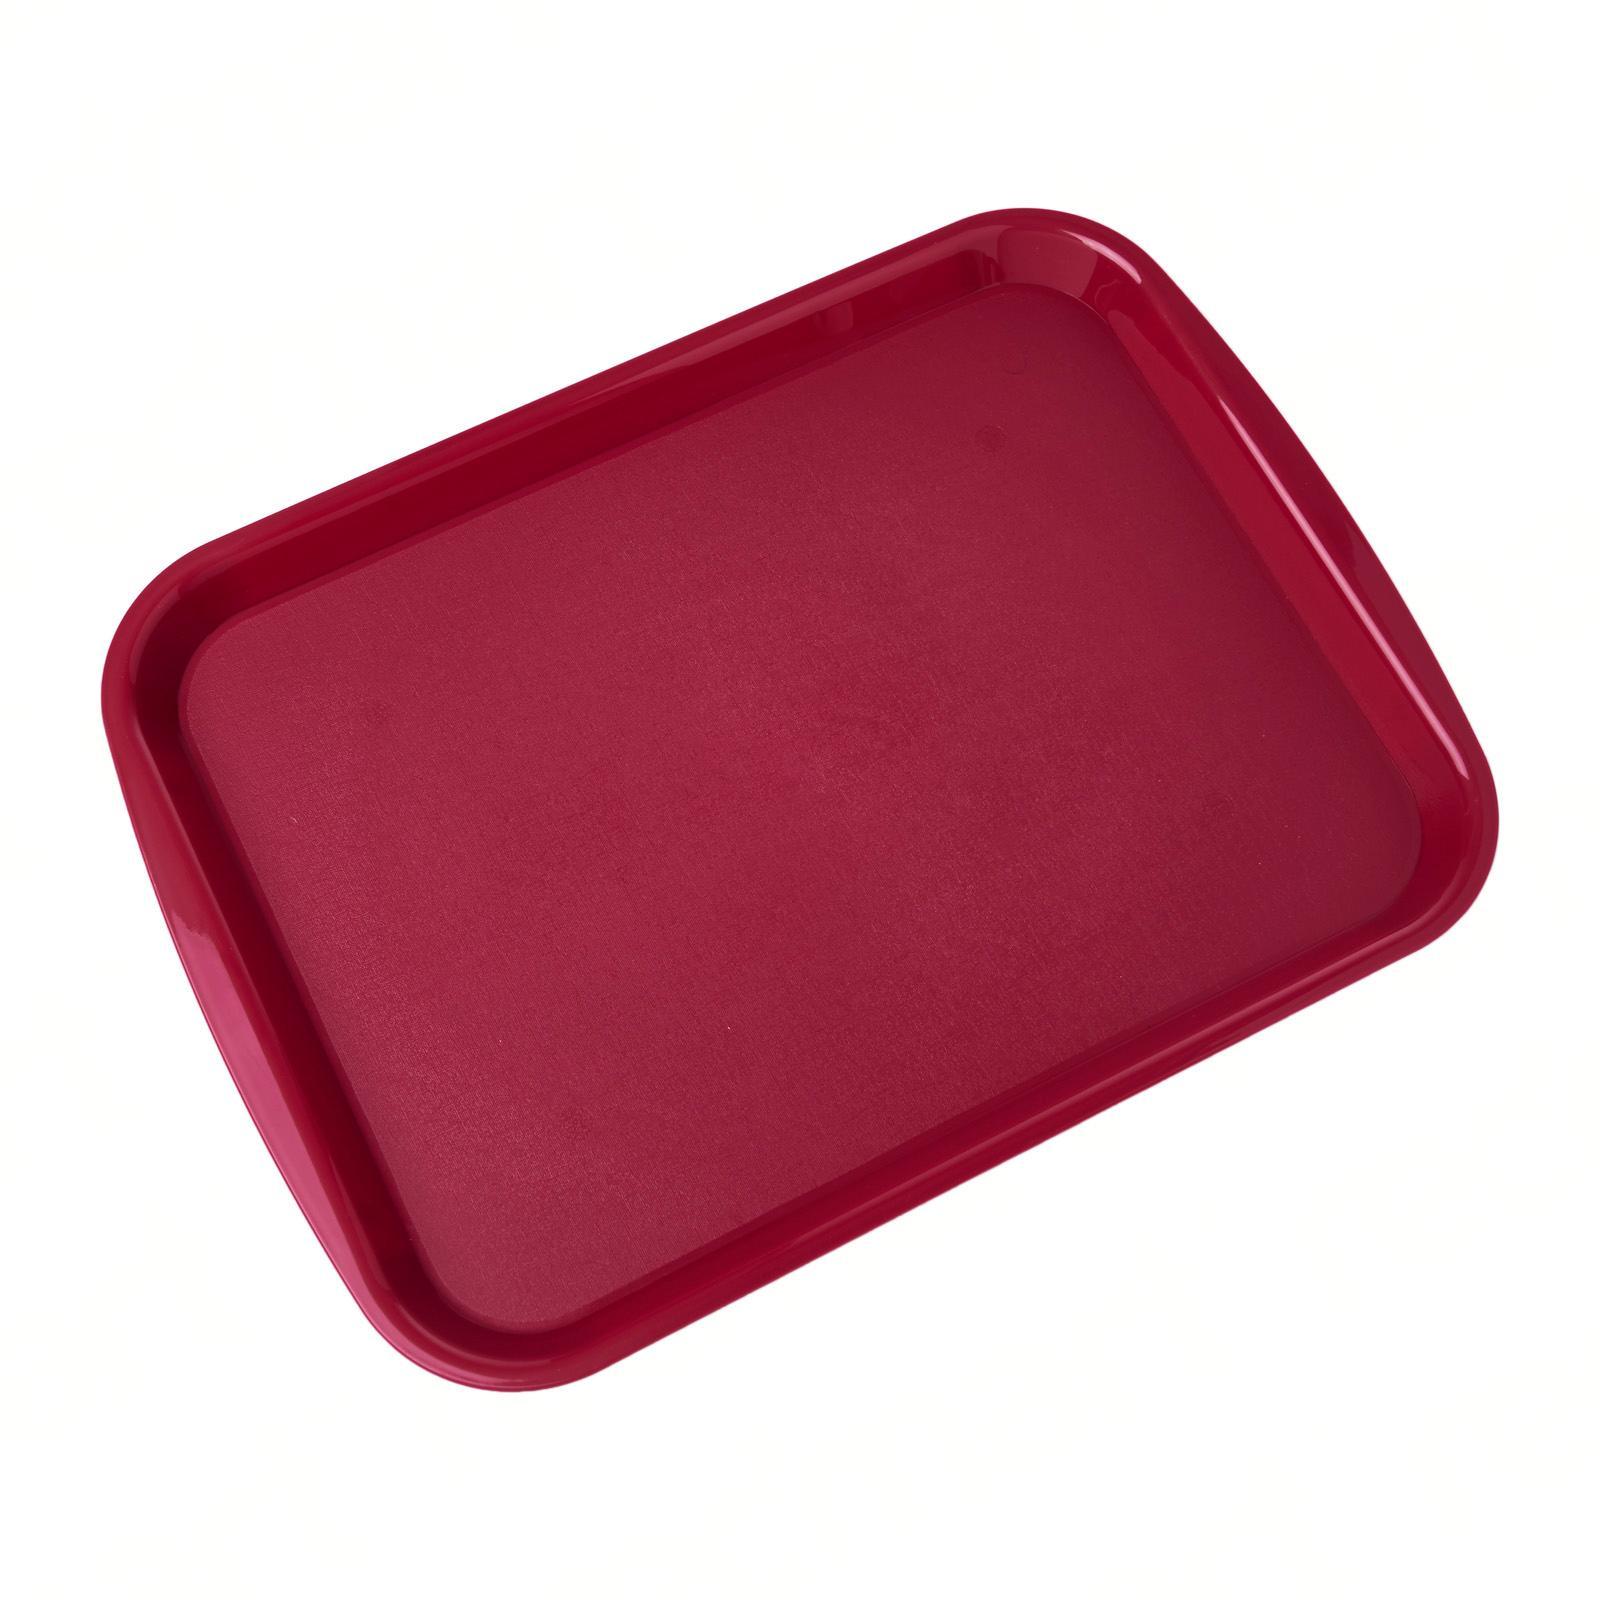 SUNNEX Fast Food Polypropylene Tray With Side Handles 36.5x27cm Burgundy